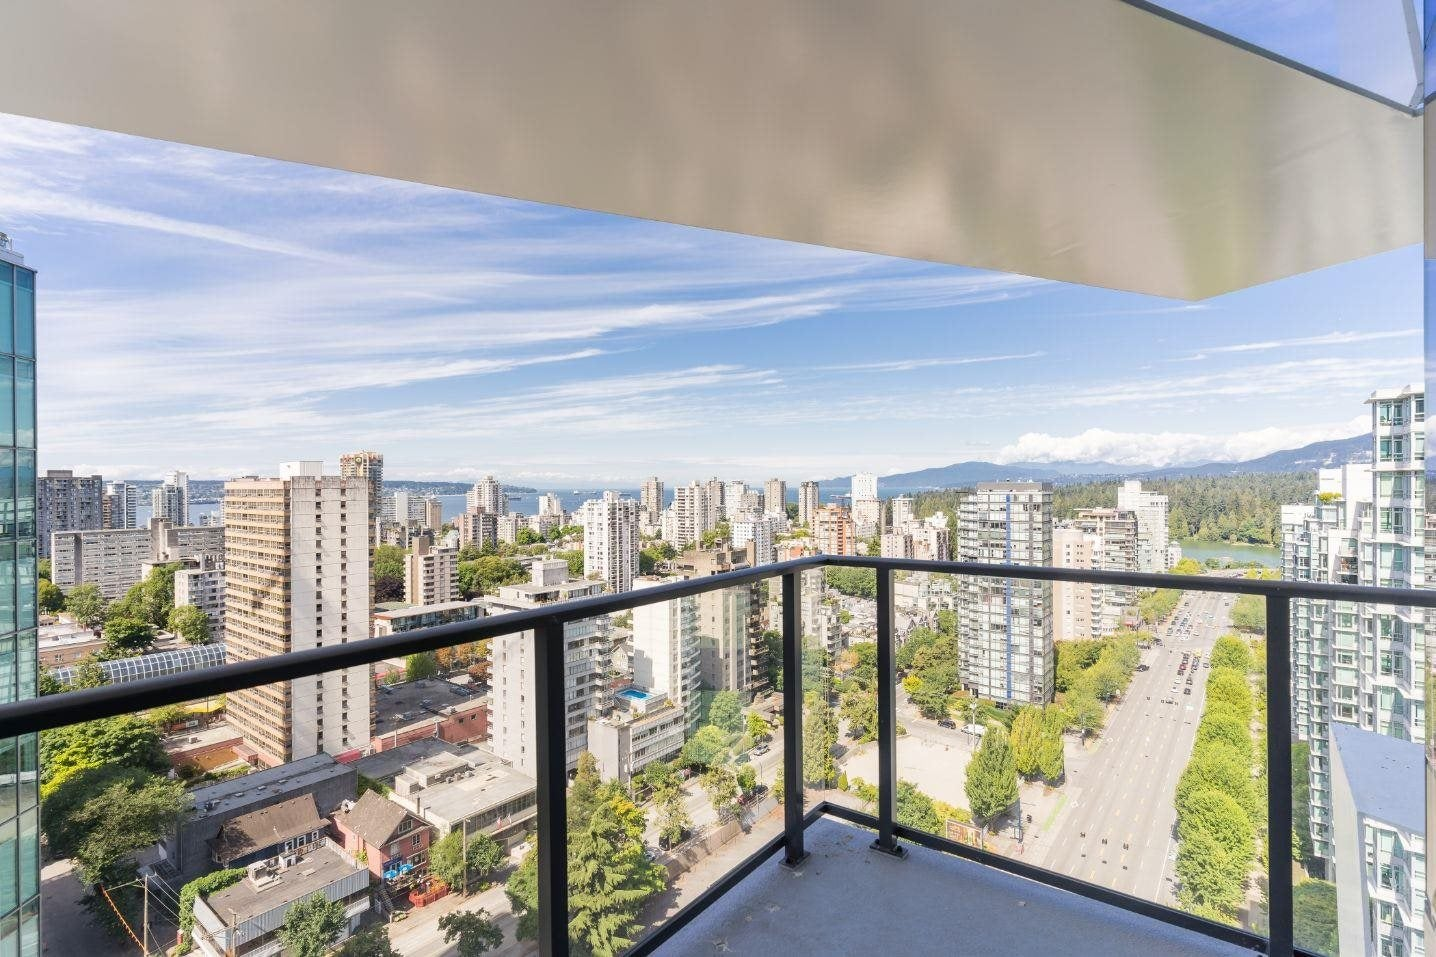 2305 620 CARDERO STREET - Coal Harbour Apartment/Condo for sale, 2 Bedrooms (R2603652) - #1